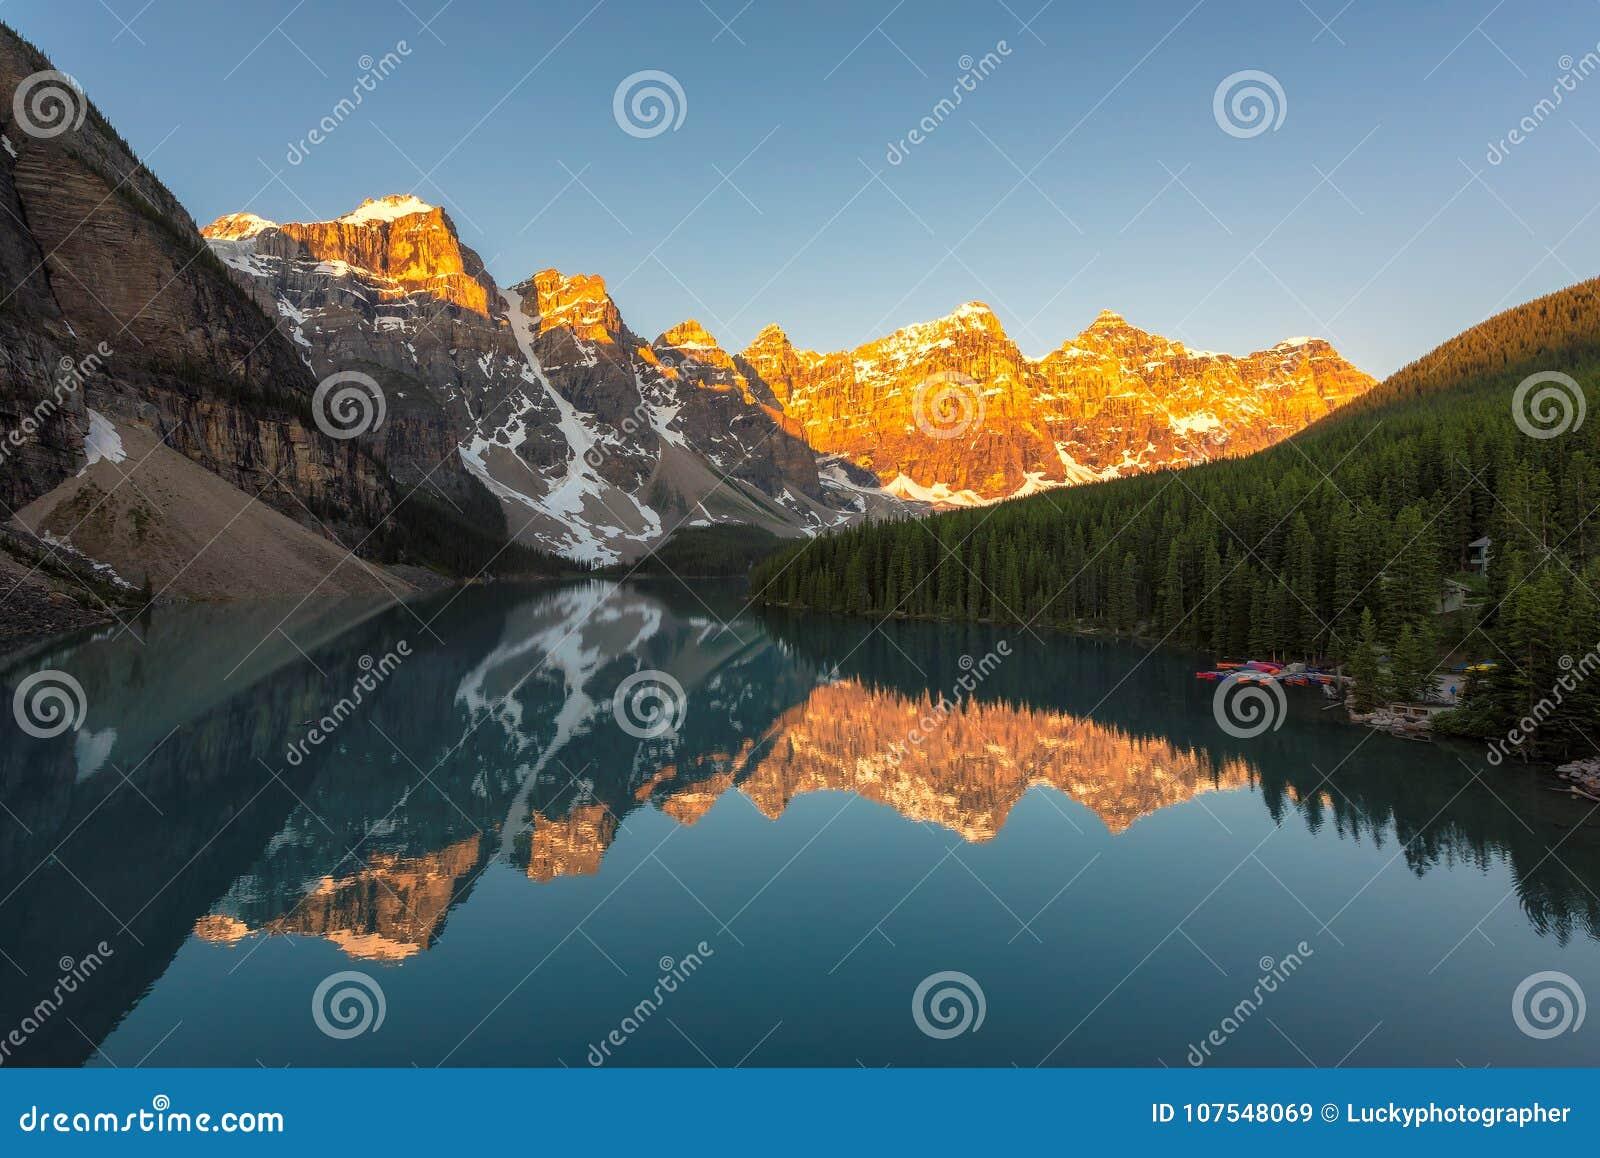 Banff加拿大湖冰碛国家公园